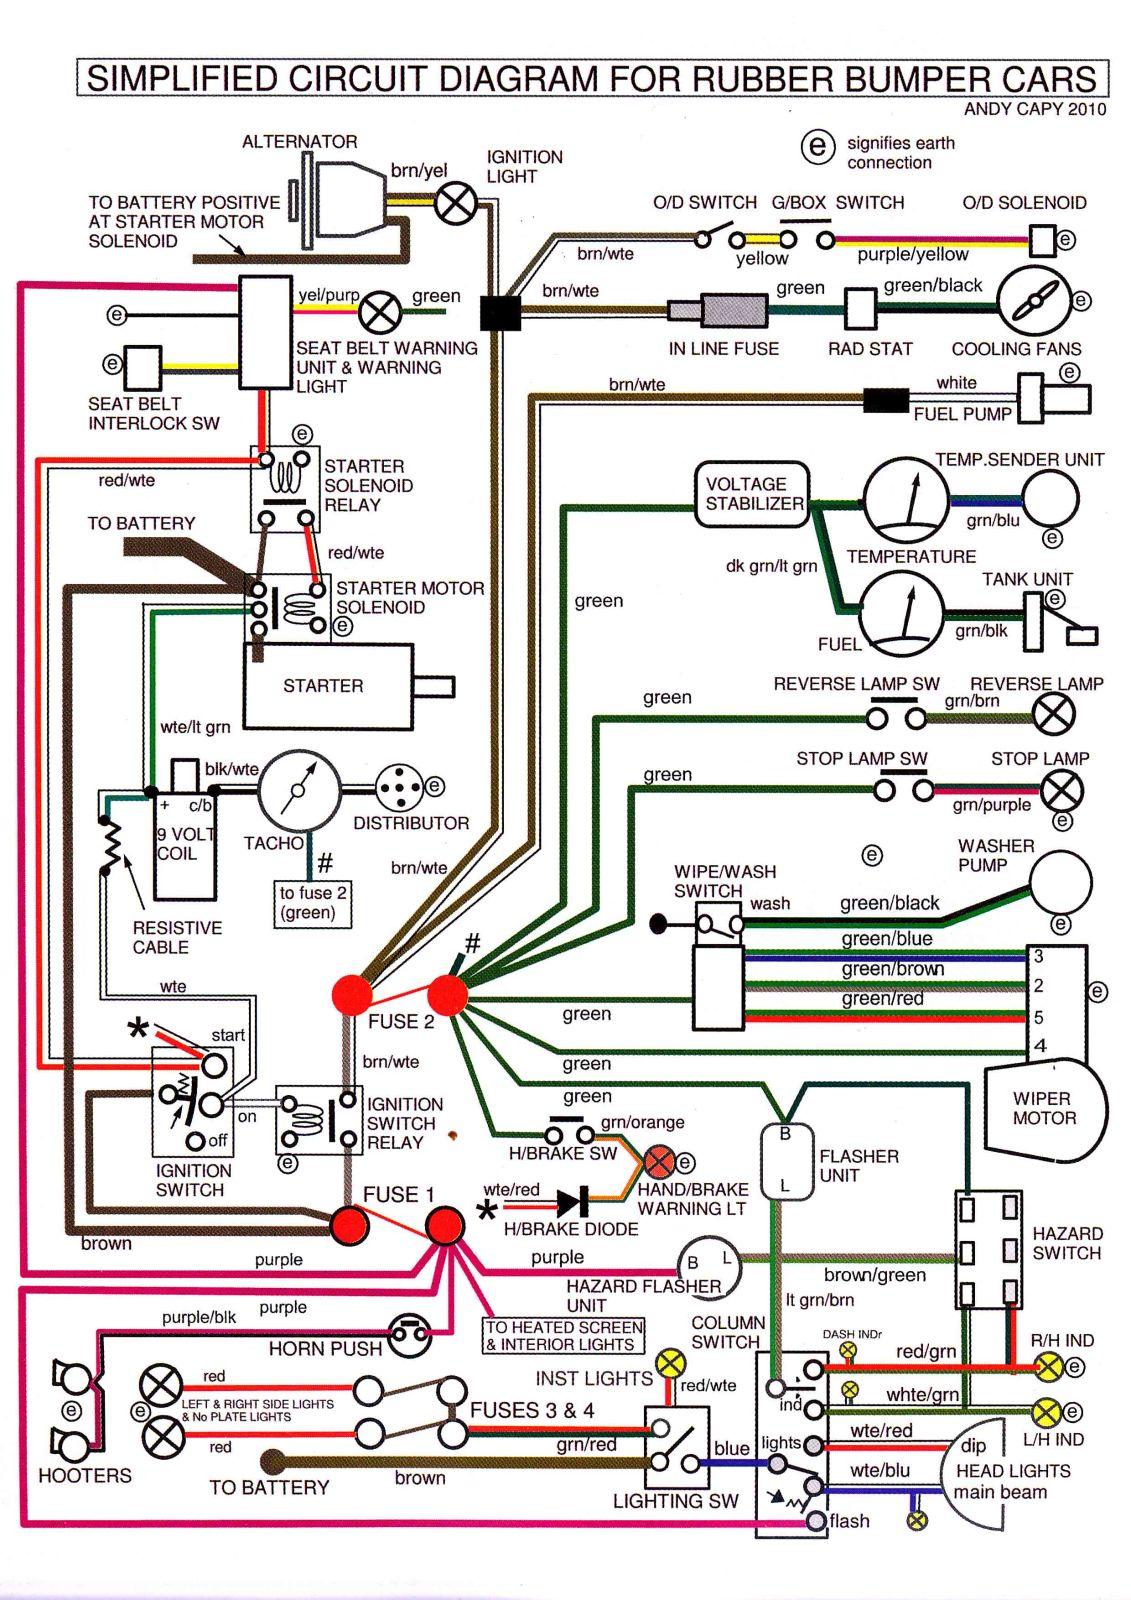 1978 Mg Midget Wiper Wiring Diagram Harness Schematics 76 Tf Mgc Schematic 1967 Mgb